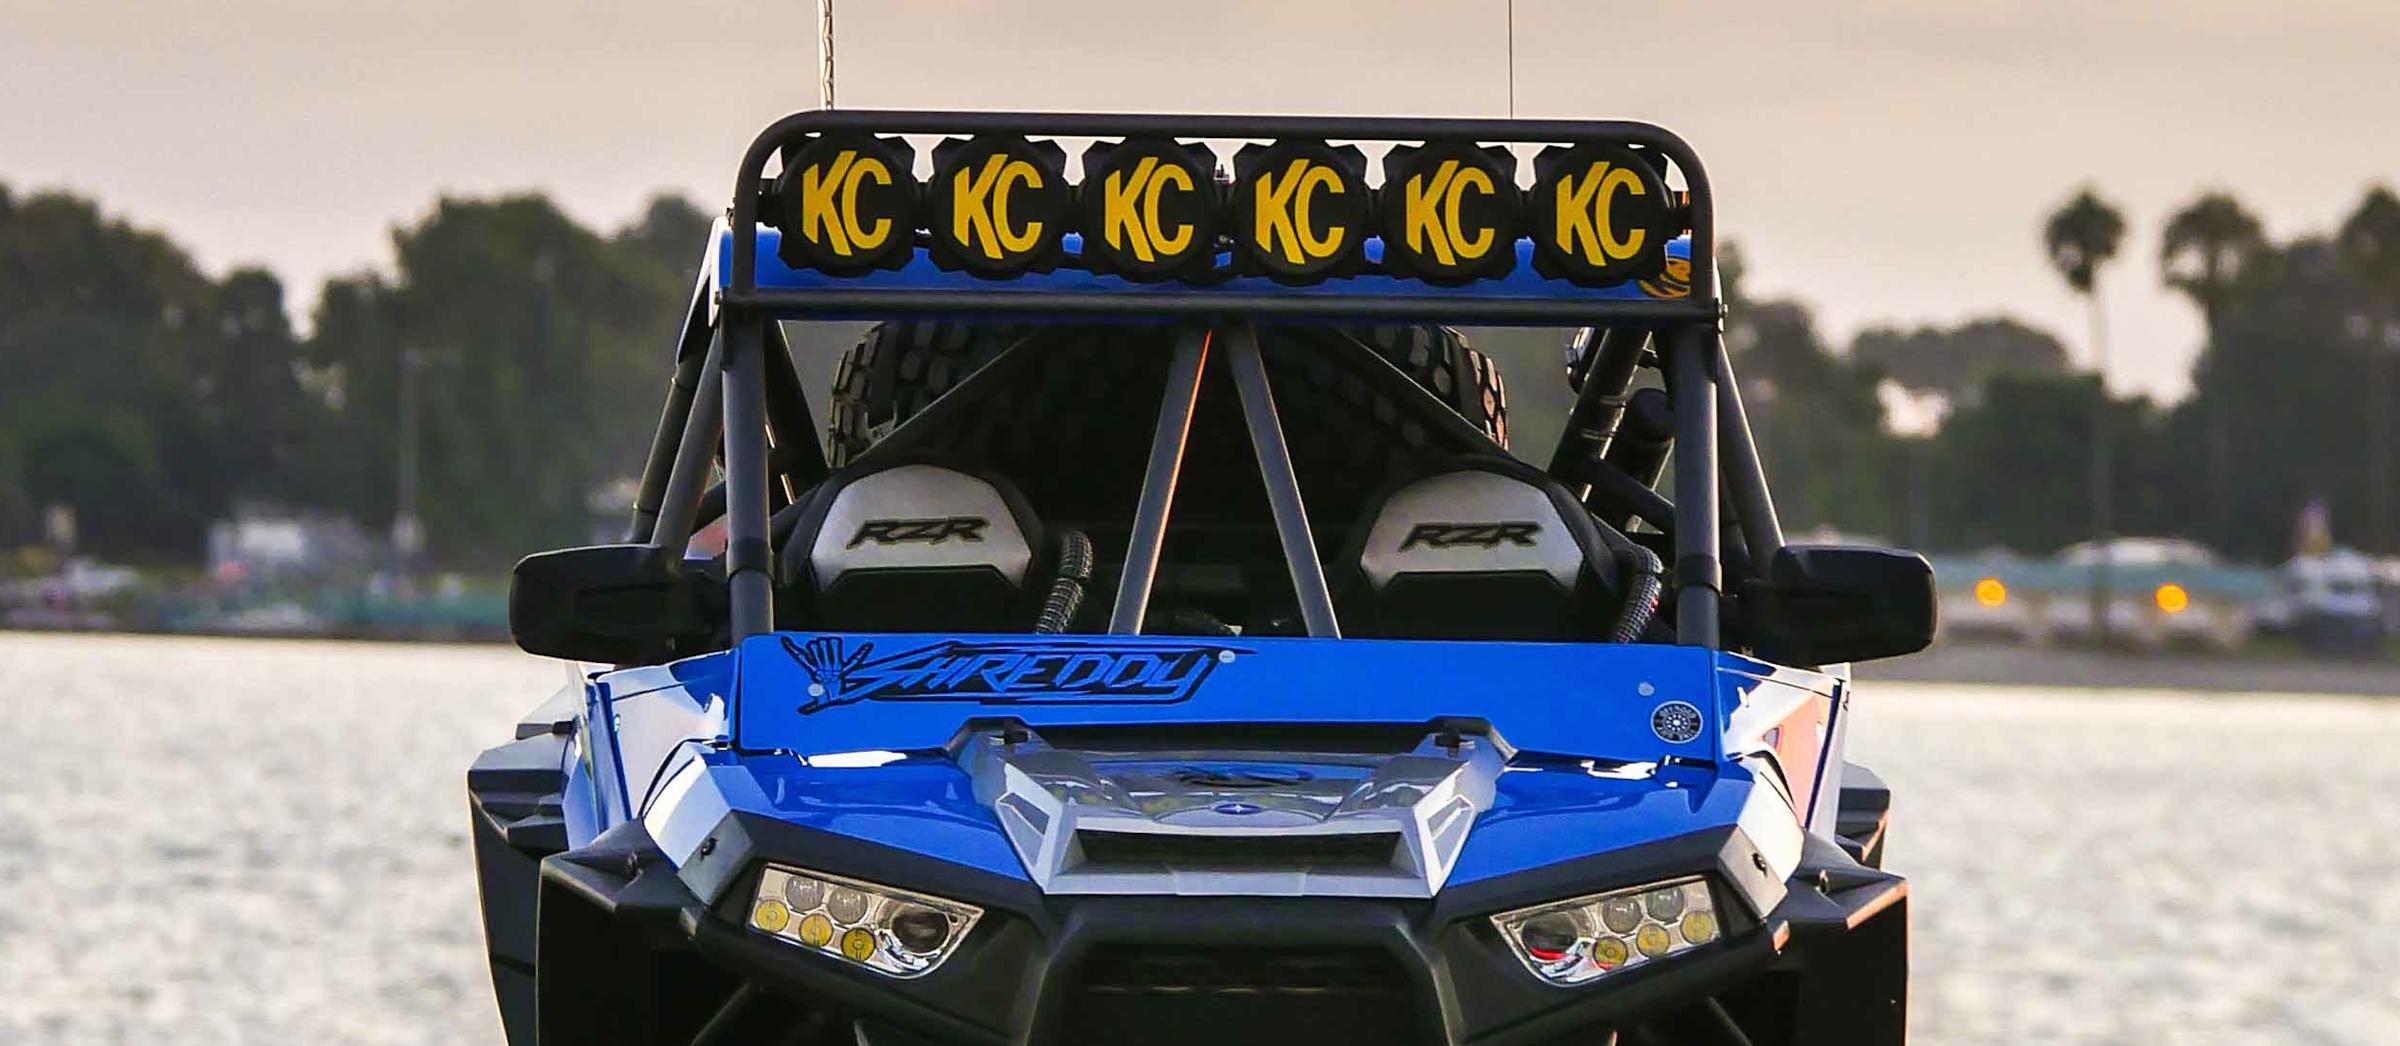 Custom Polaris RZR Off Road Build with KC Lights - Image #06